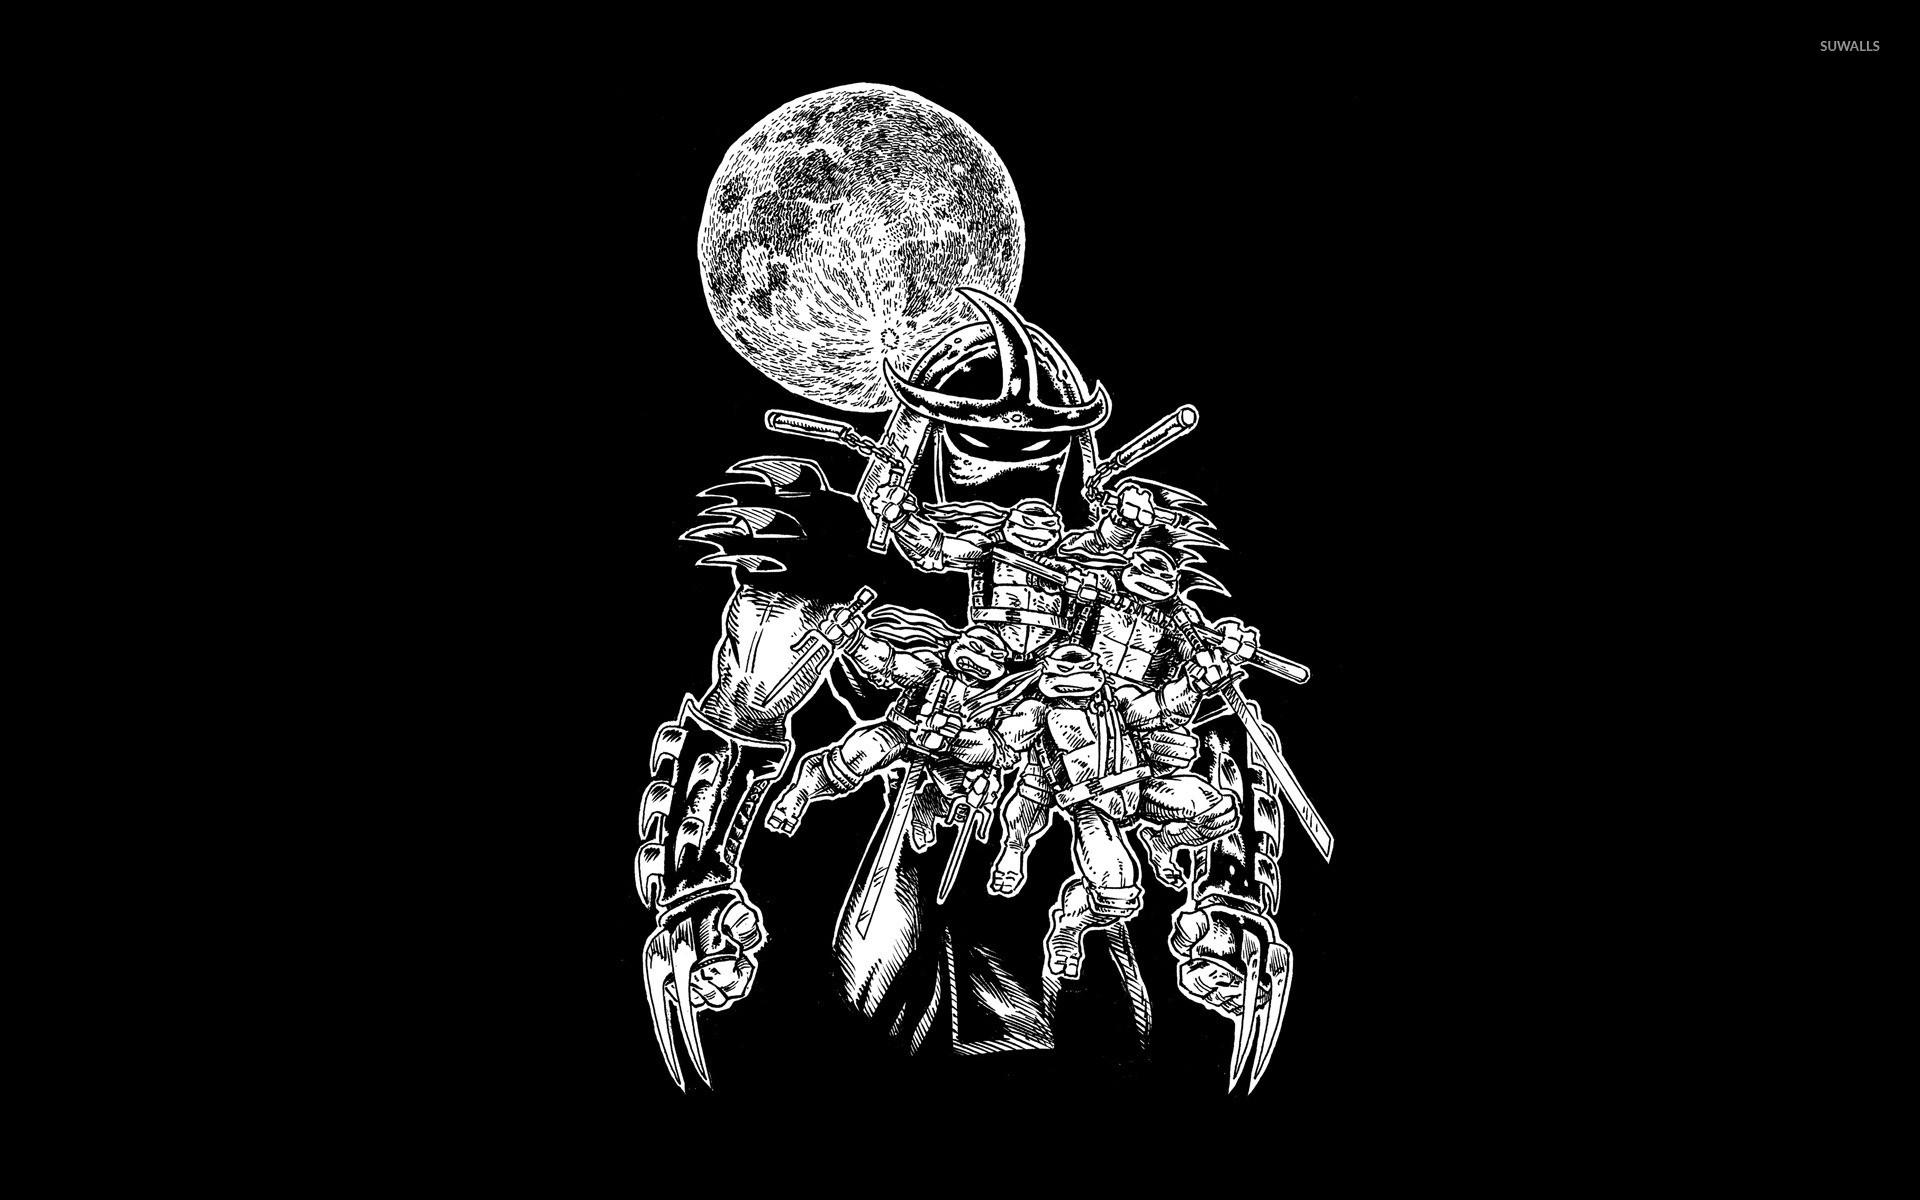 Teenage Mutant Ninja Turtles [4] wallpaper jpg